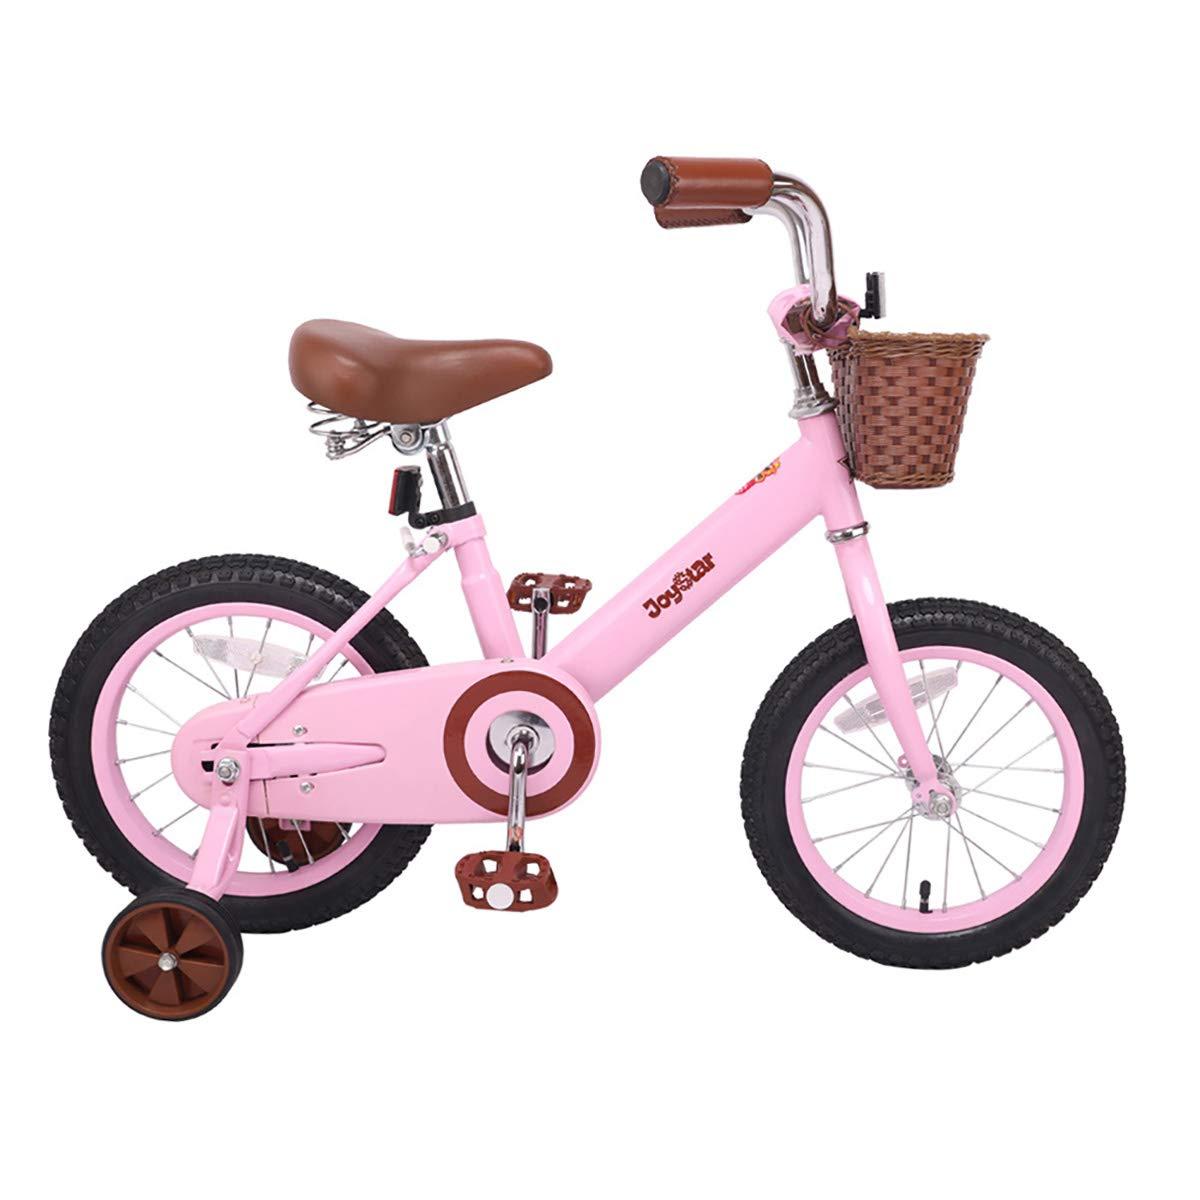 JOYSTAR 14 & 16 Inch Kids Bike with Basket & Training Wheels for 3-7 Years Old Girls & Boys (Beige & Pink) product image